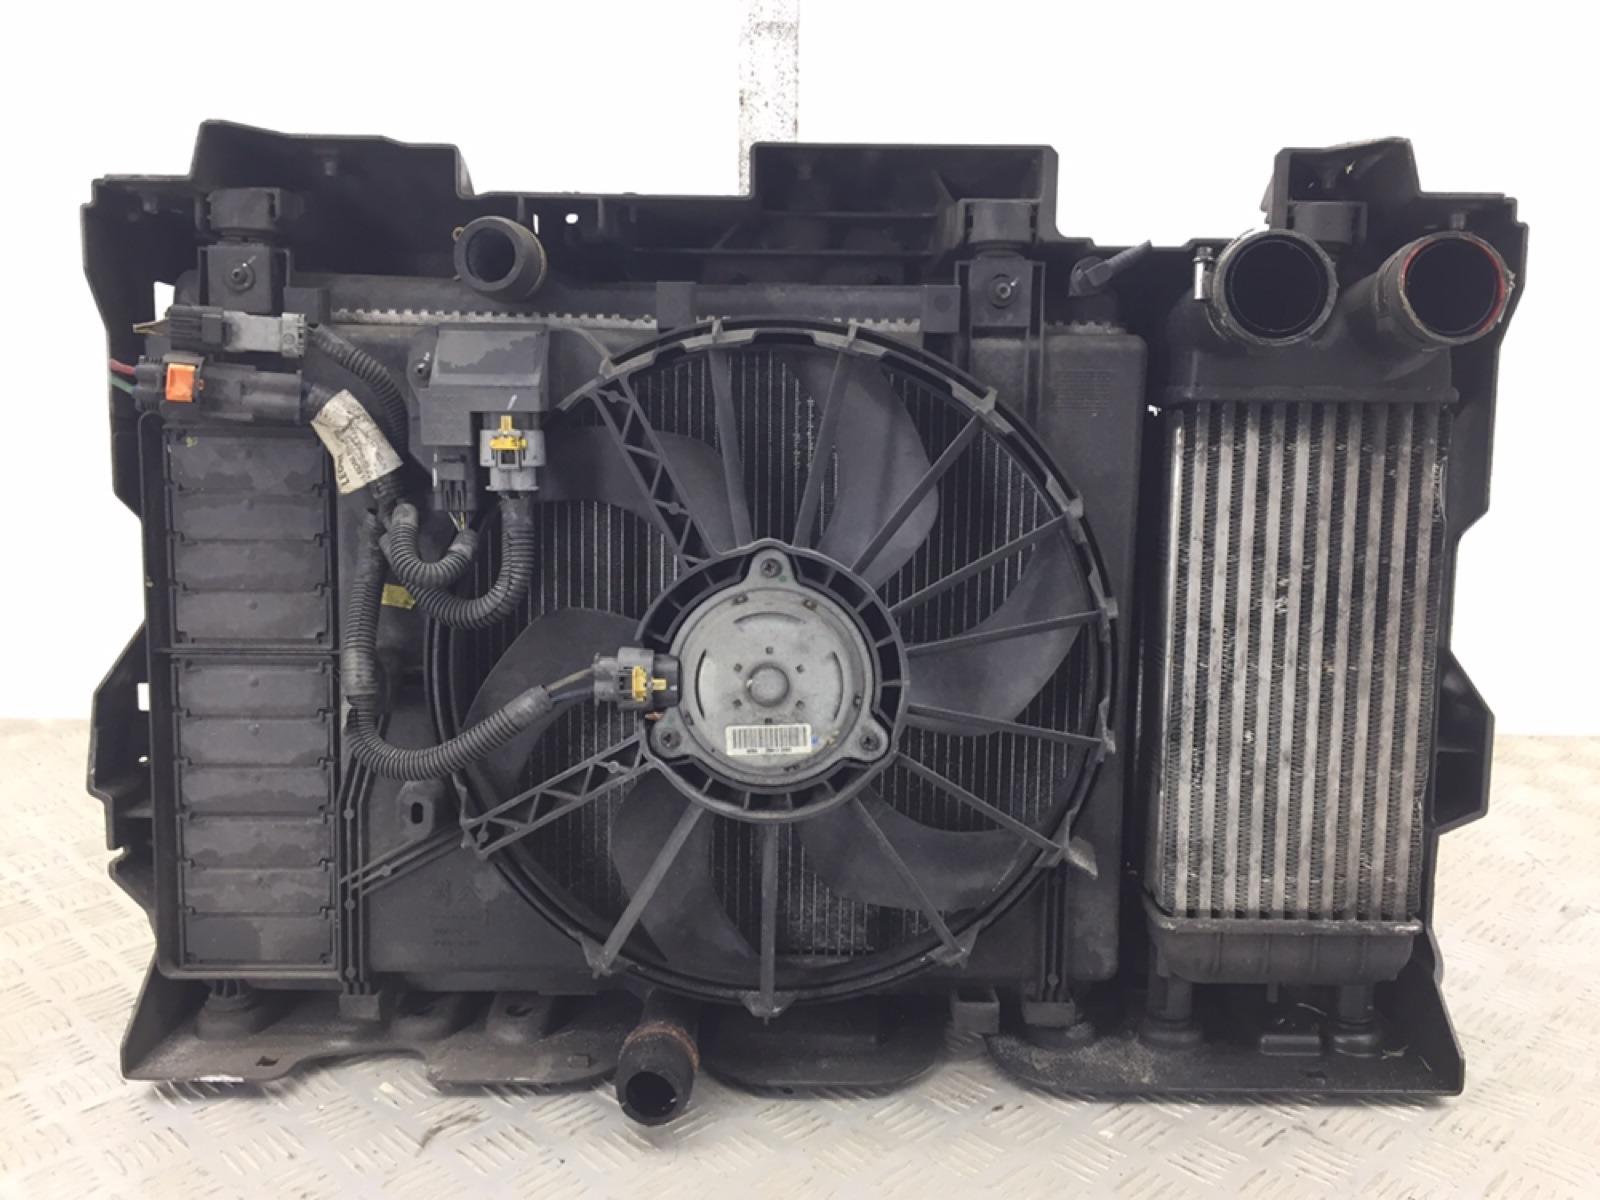 Кассета радиаторов Peugeot 508 1.6 HDI 2011 (б/у)